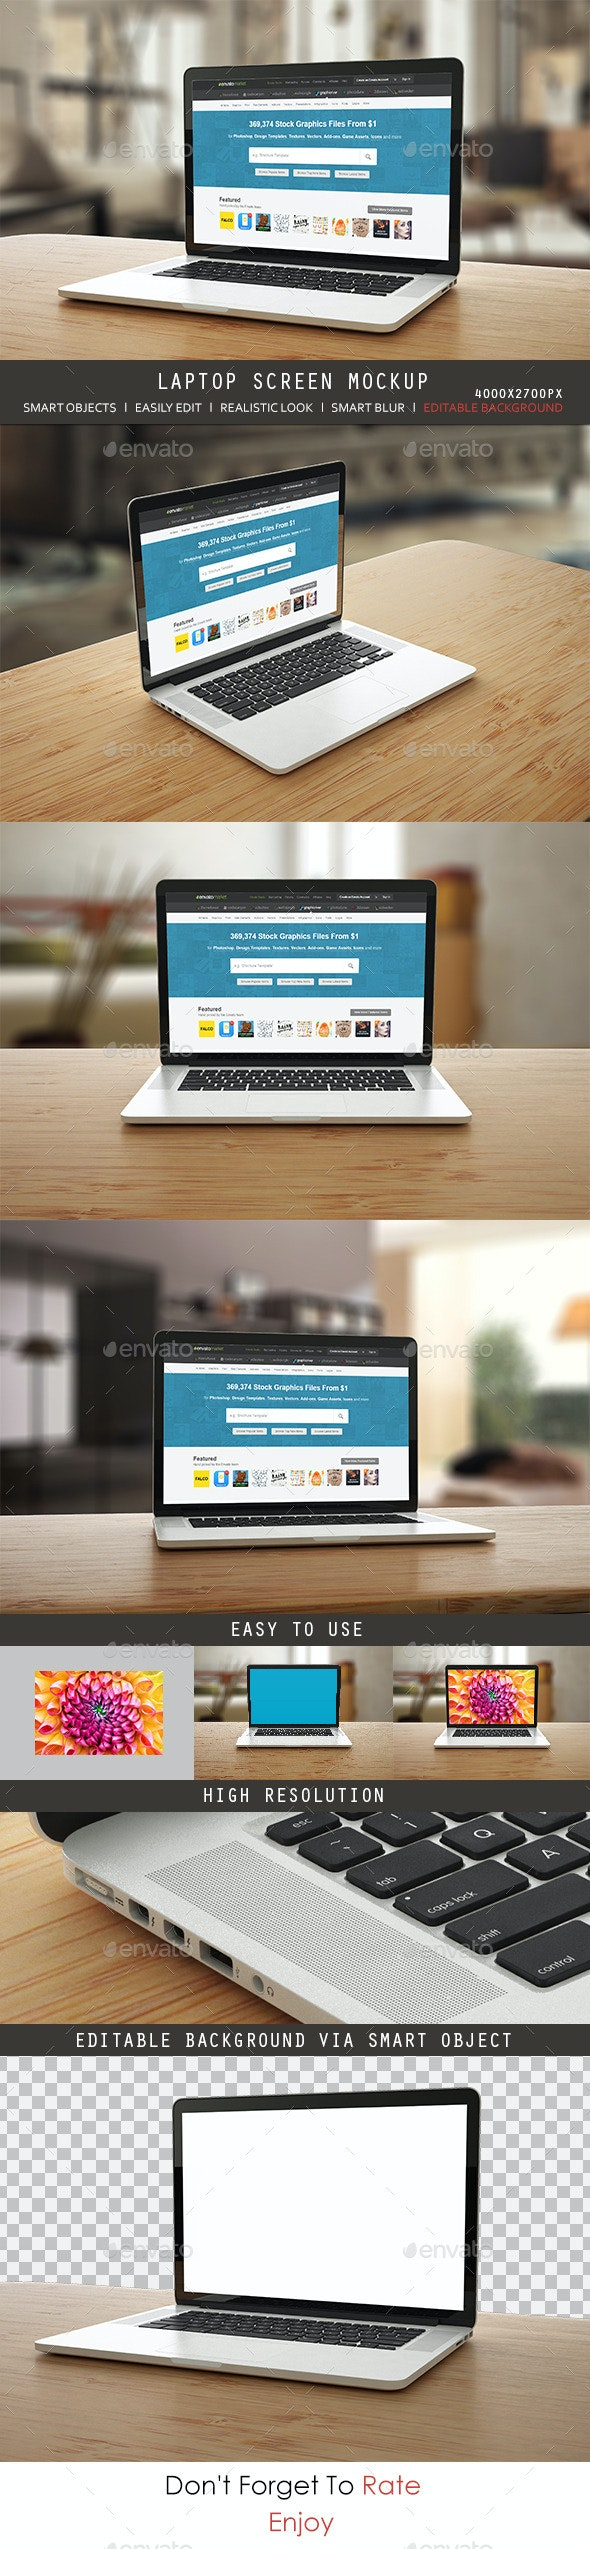 Laptop Screen Mock up  - Laptop Displays